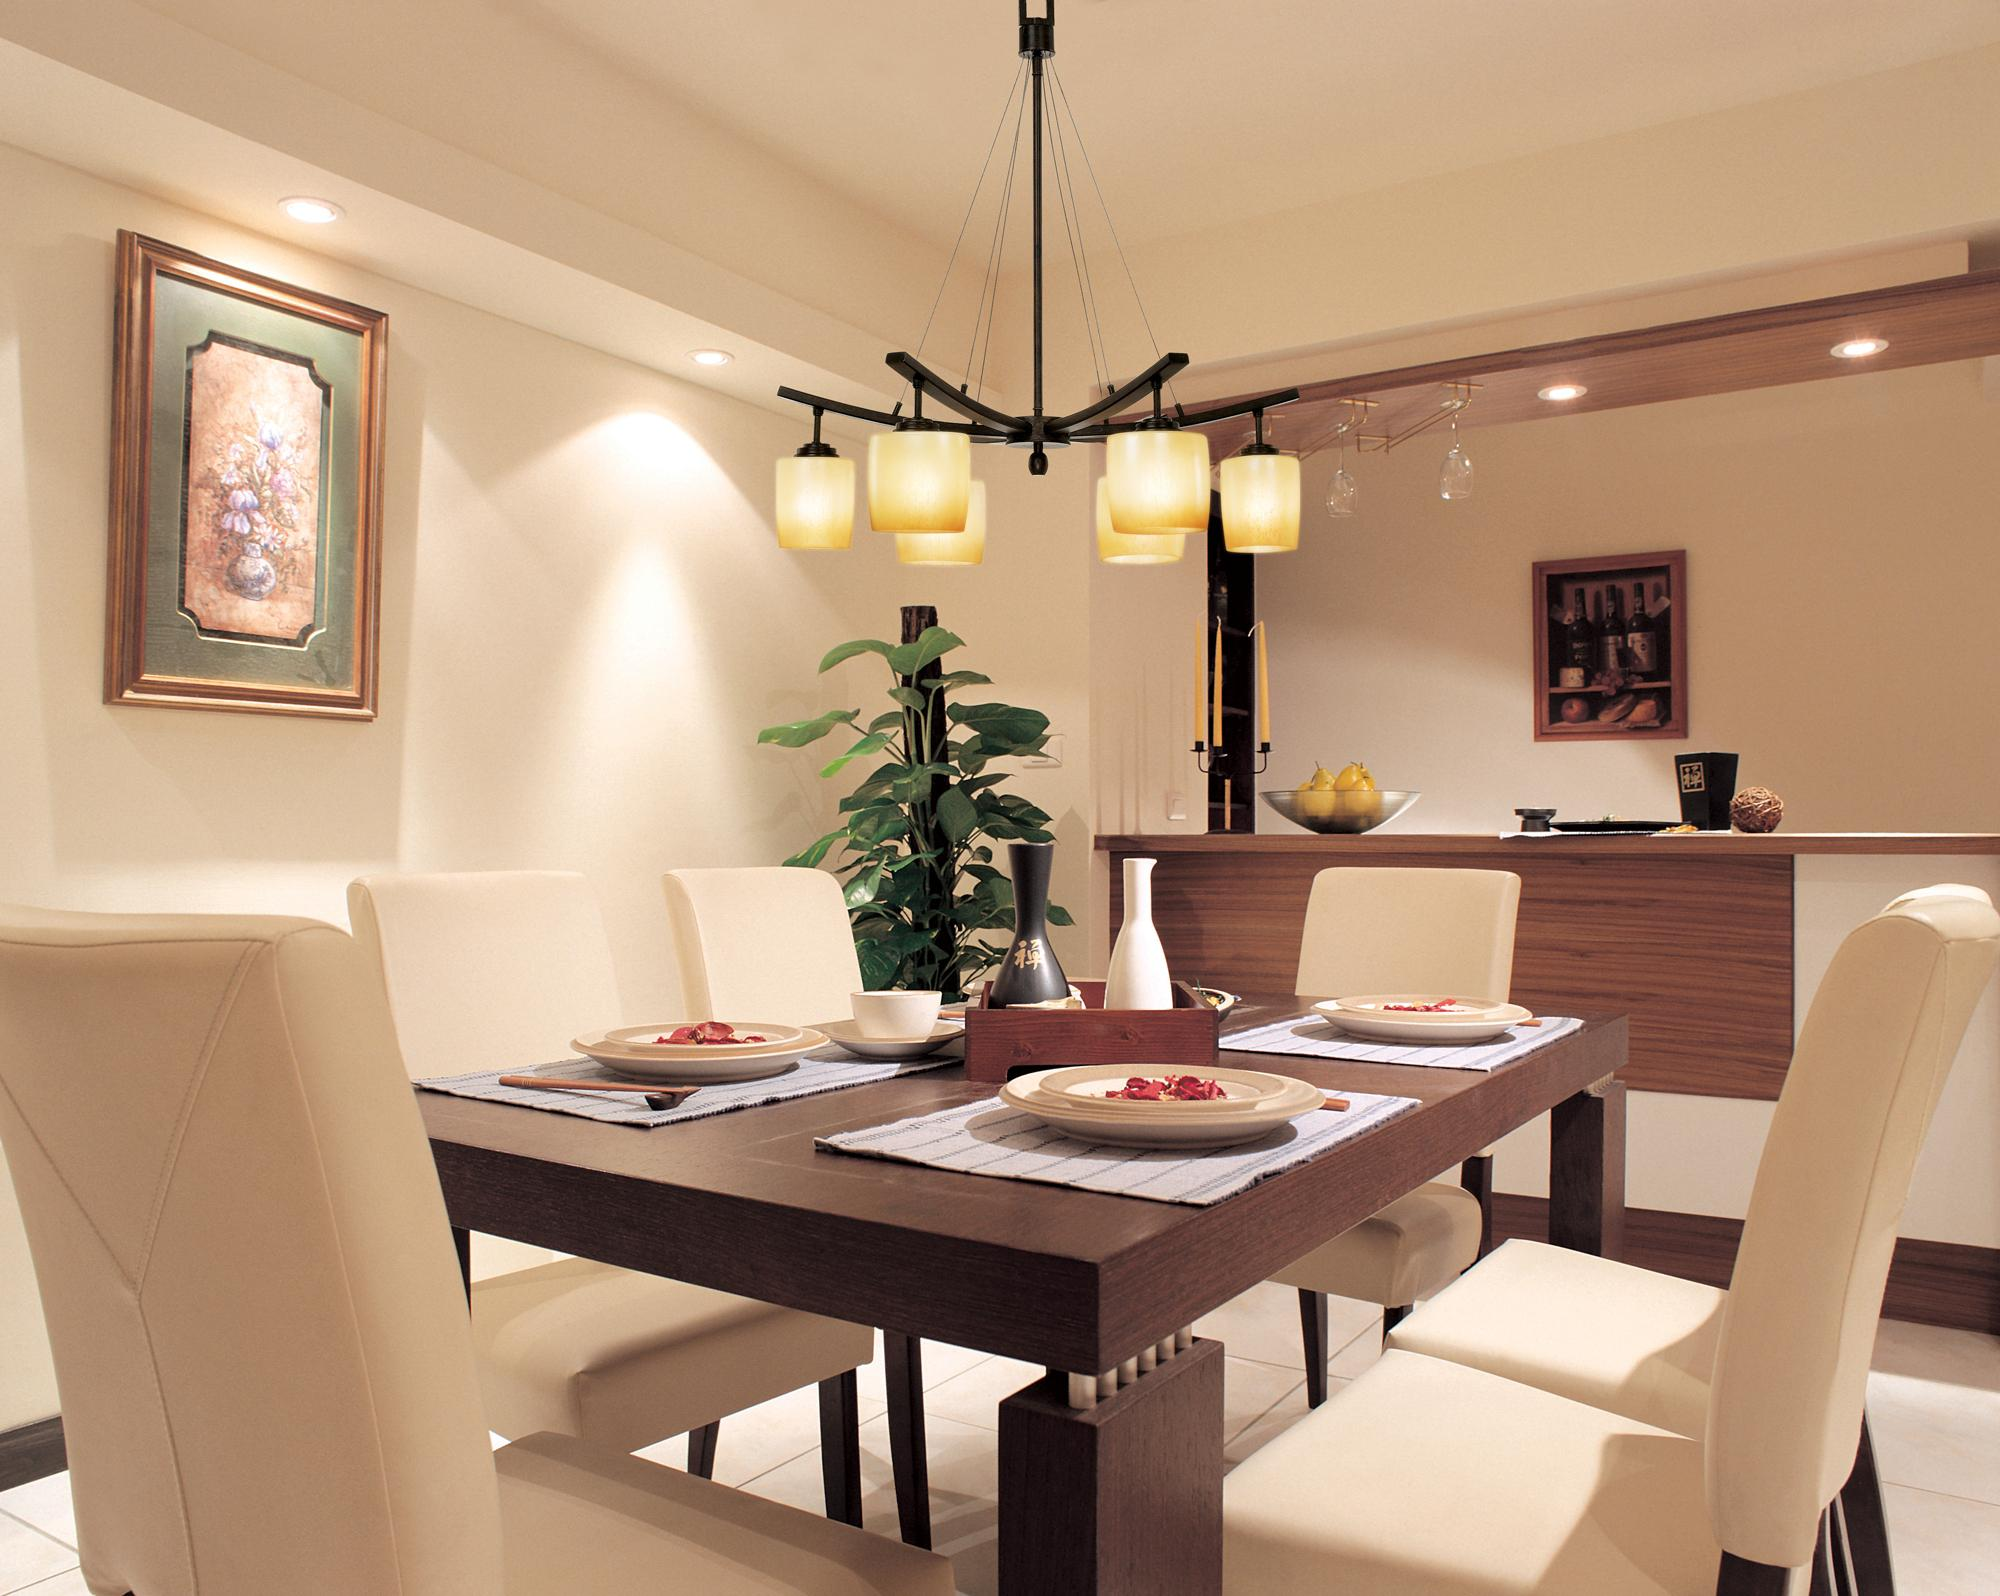 Light Fixtures Dining Room Ideas Part - 48: Dining Room Table Light Fixtures ...